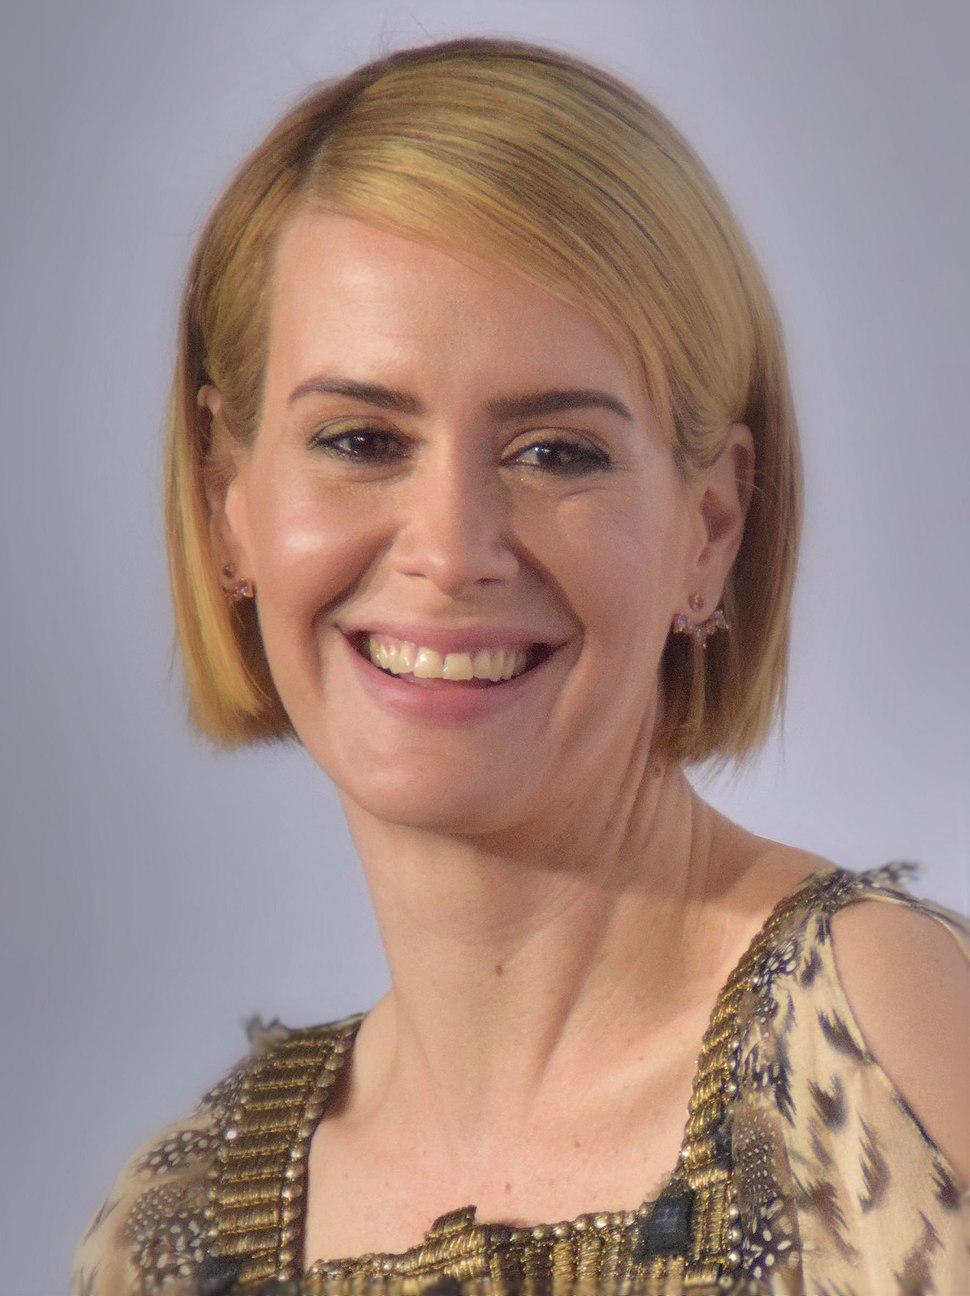 Sarah Paulson in 2015